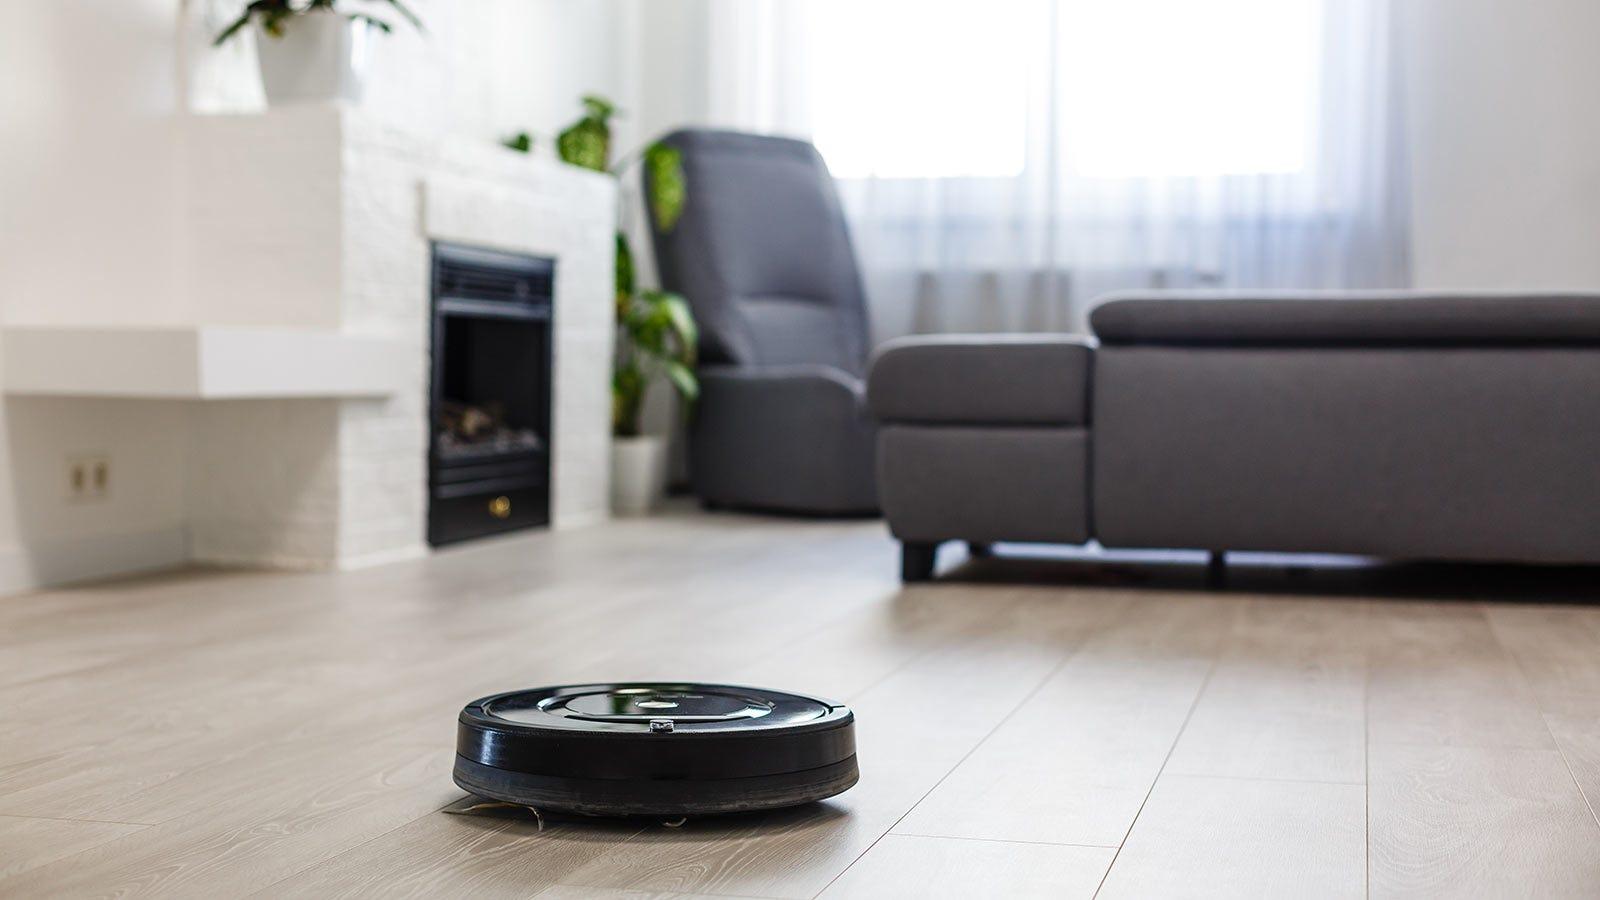 A robotic vacuum cleaner on a hardwood floor.